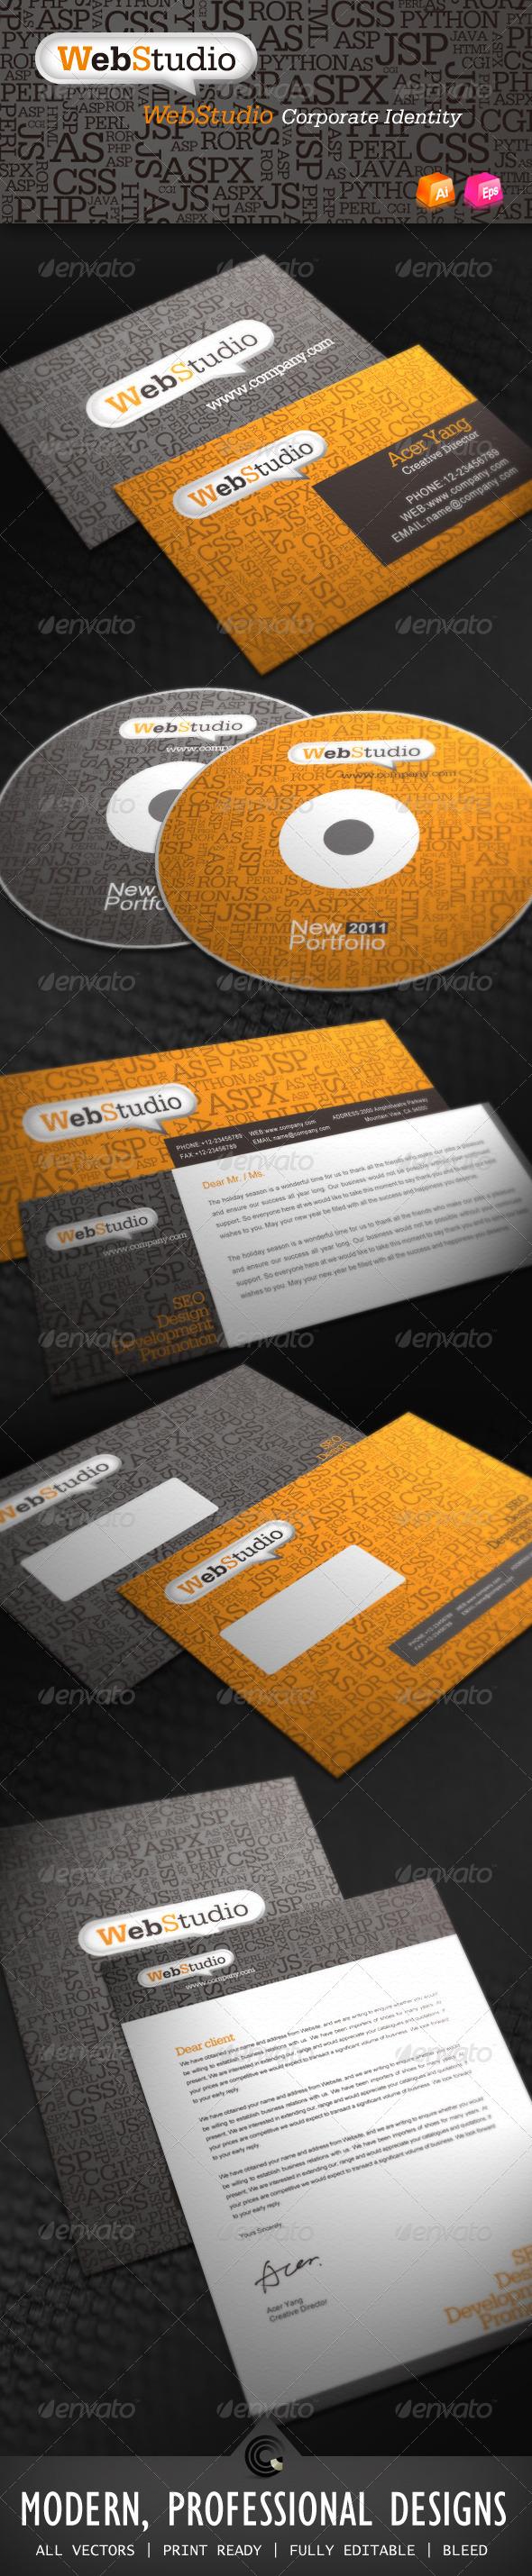 Web Studio Corporate Identity - Stationery Print Templates